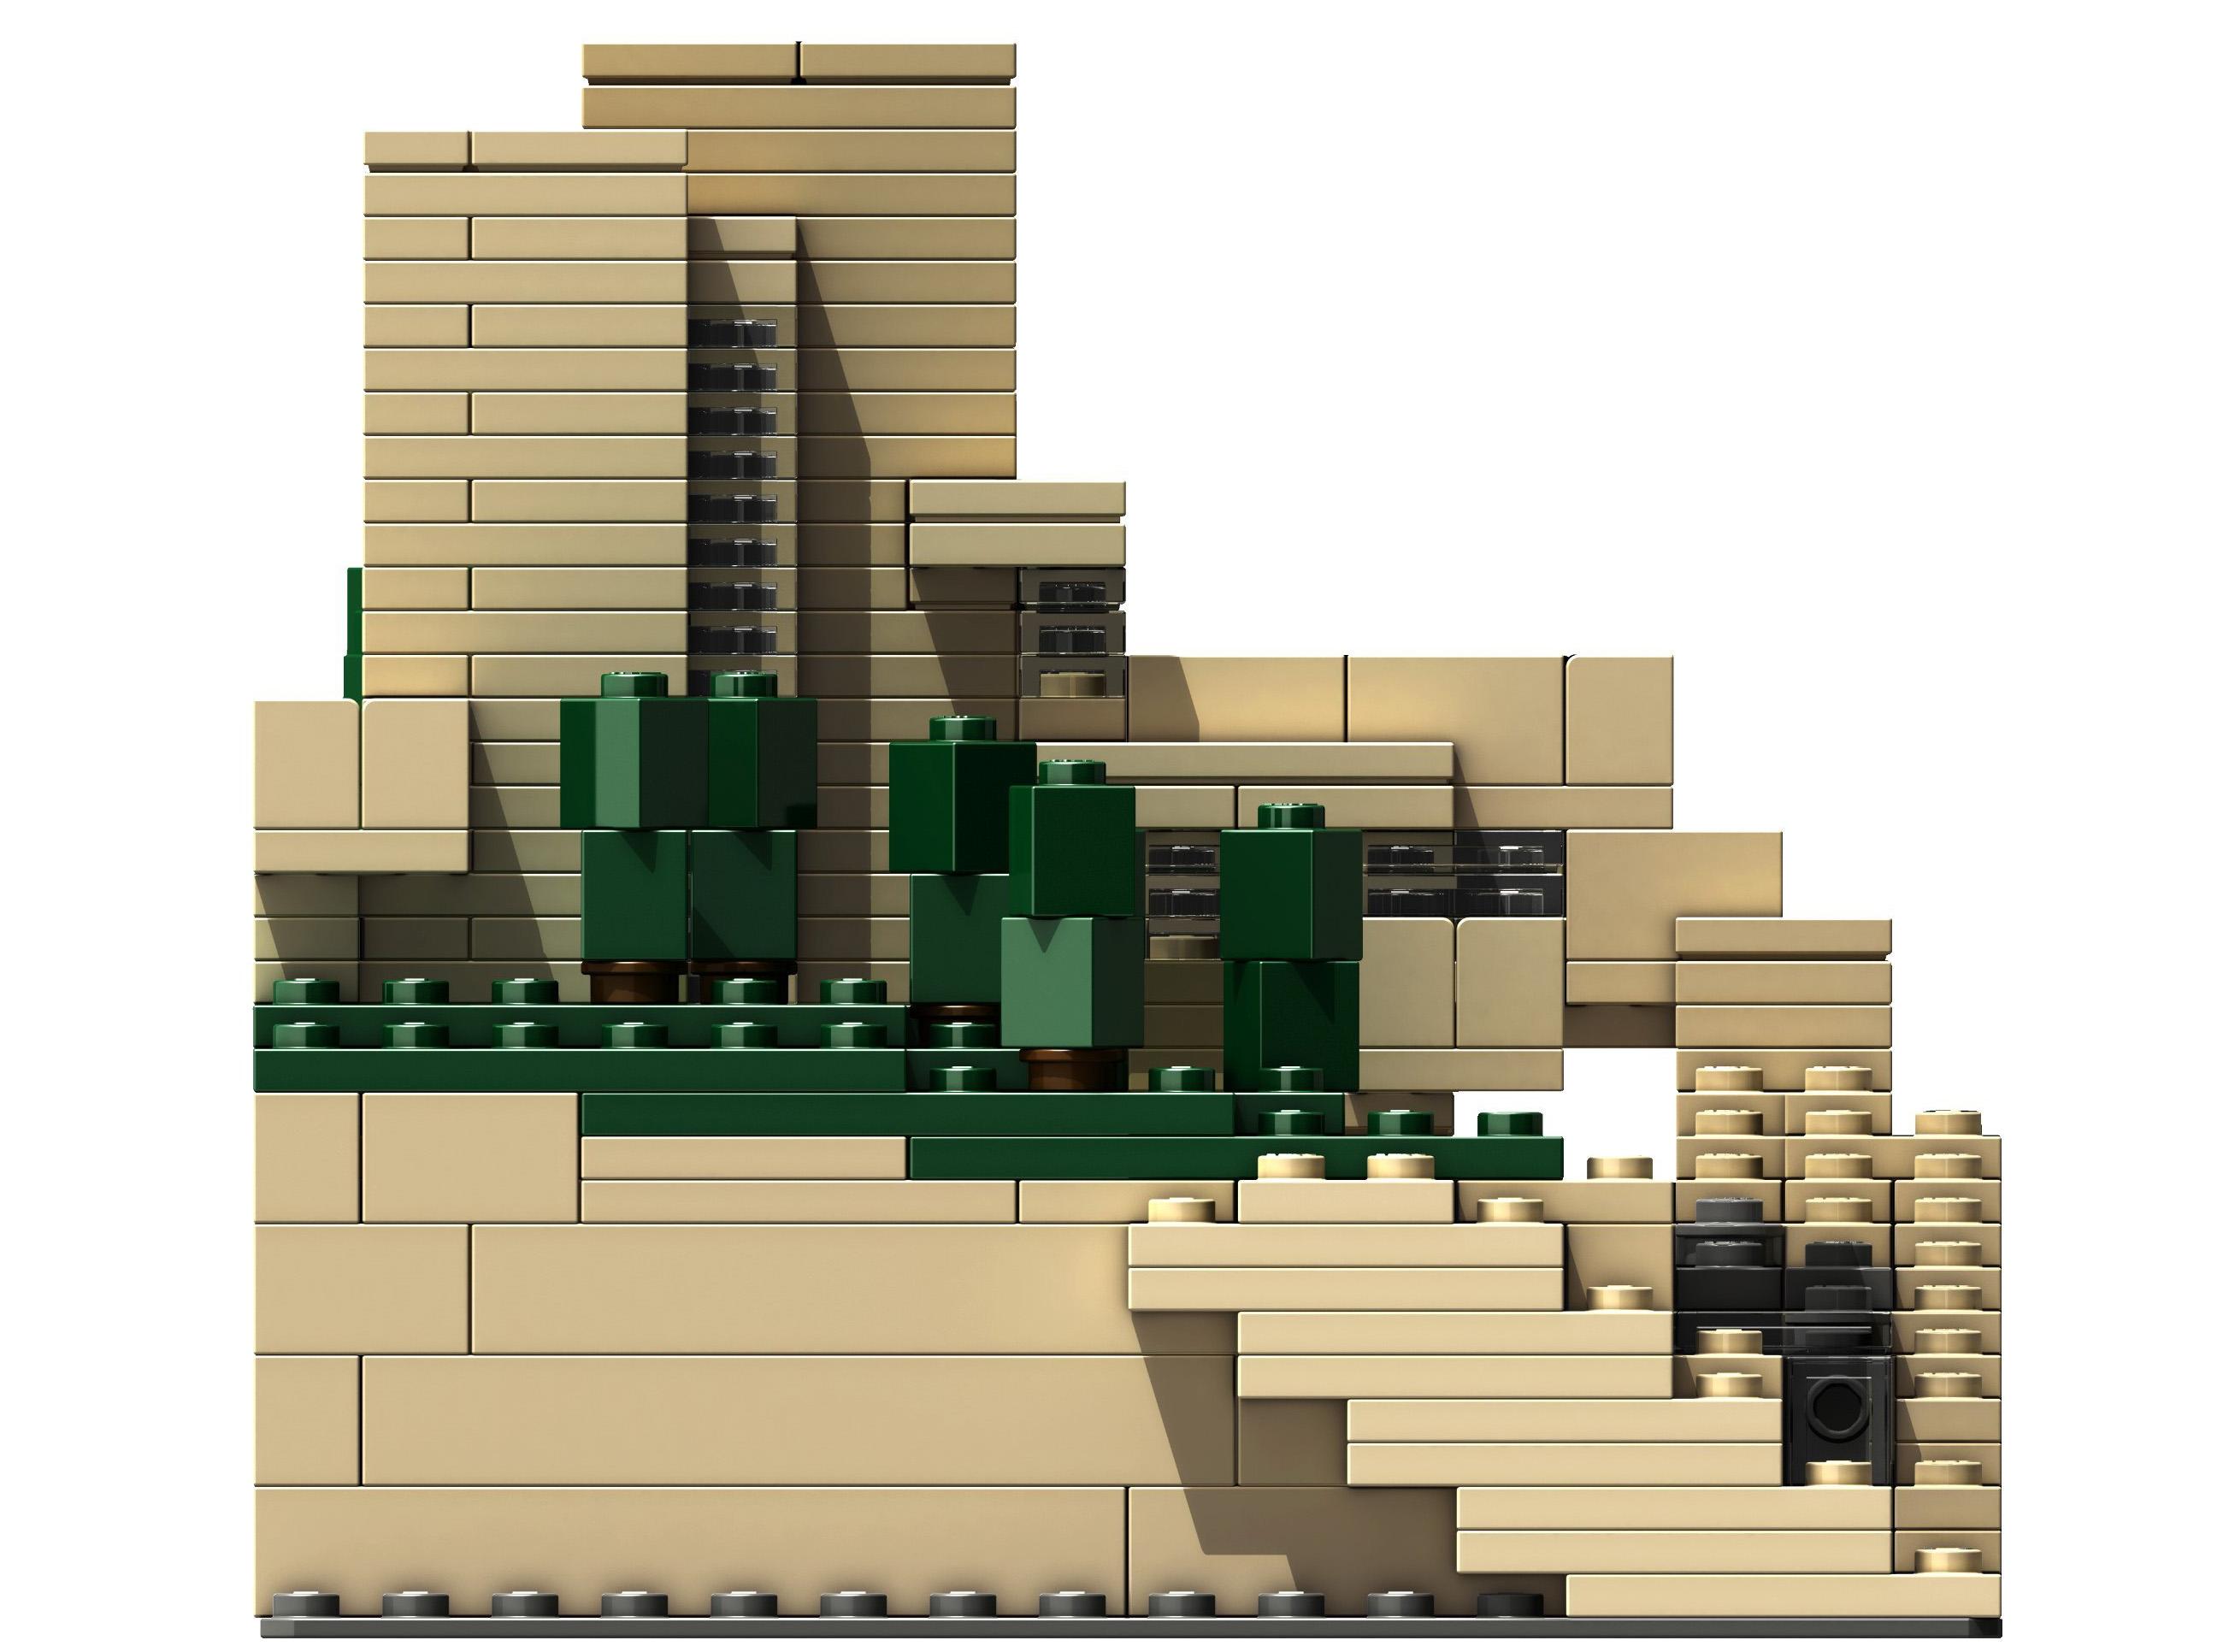 Image lego fallingwater brickipedia the lego wiki - Falling waters lego ...